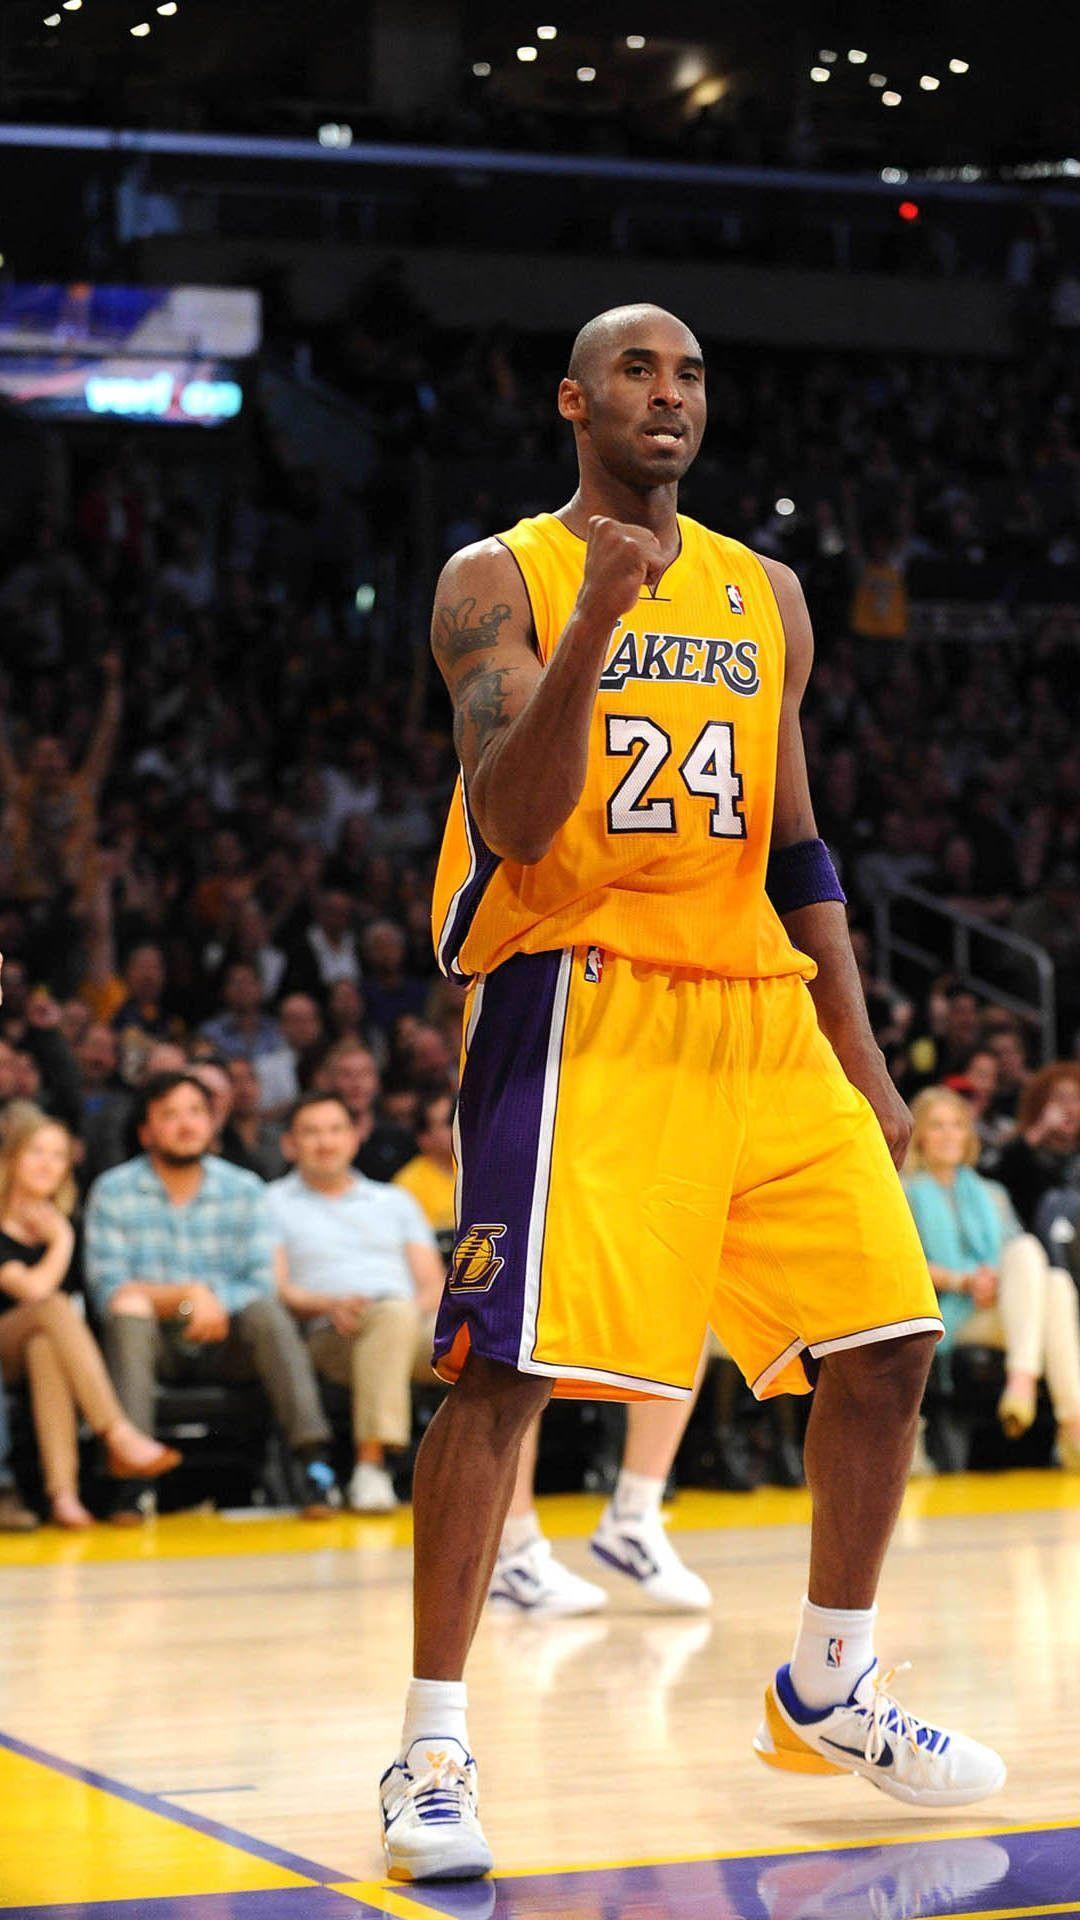 Dunk Kobe Bryant Wallpaper Download Kobe Bryant Wallpaper Kobe Bryant Dunk Kobe Bryant Pictures